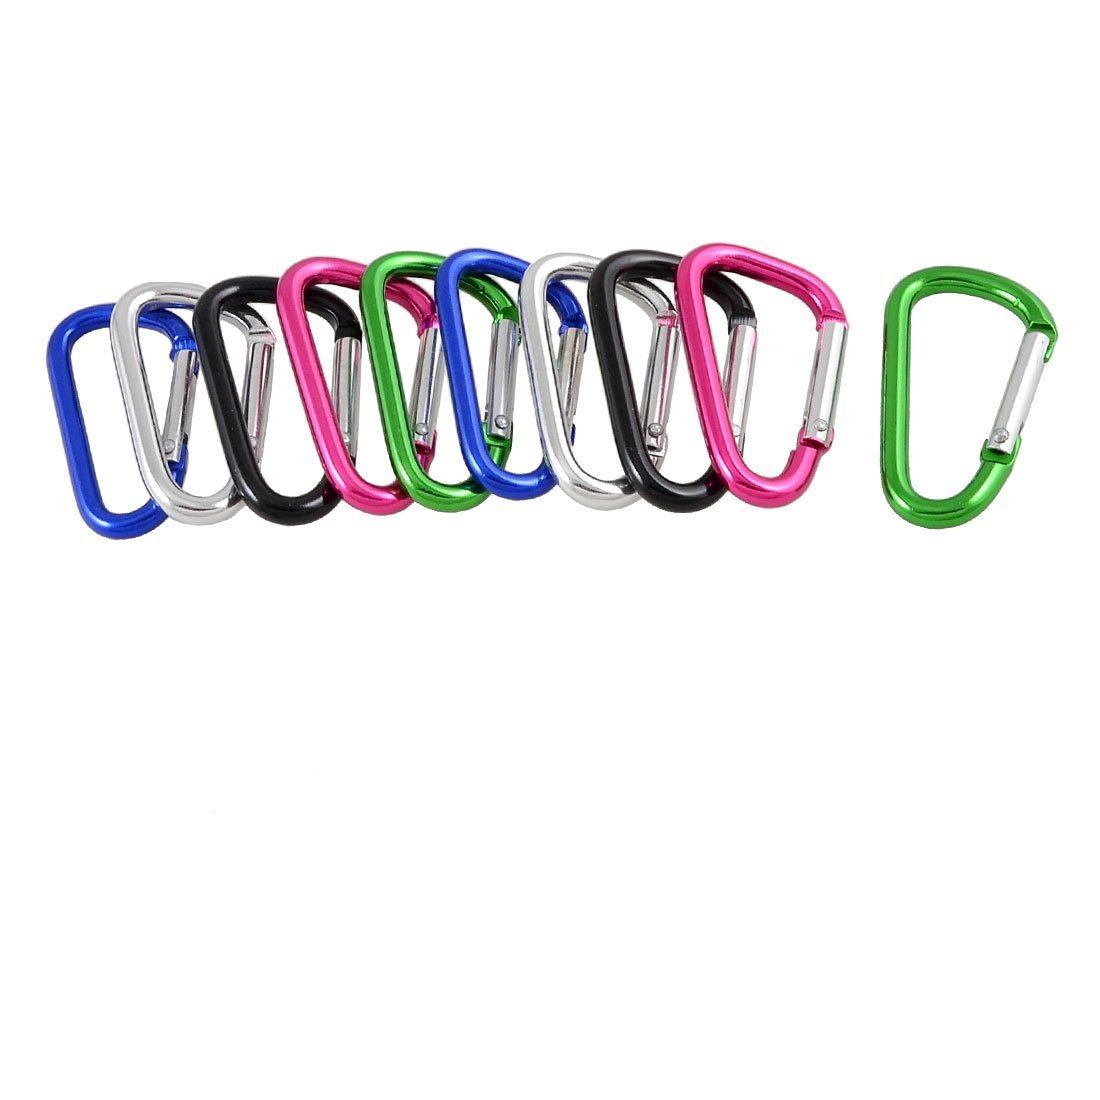 GBSTORE 10 Keychain Pcs- Colours Assorted Key Colours D Shaped Aluminium Alloy Snap Clip Key Chain Carabiner Hook Carabiner Keychain B01H6CL1E8, Bag shop WAKABAYASHI:dae1a6f9 --- itxassou.fr